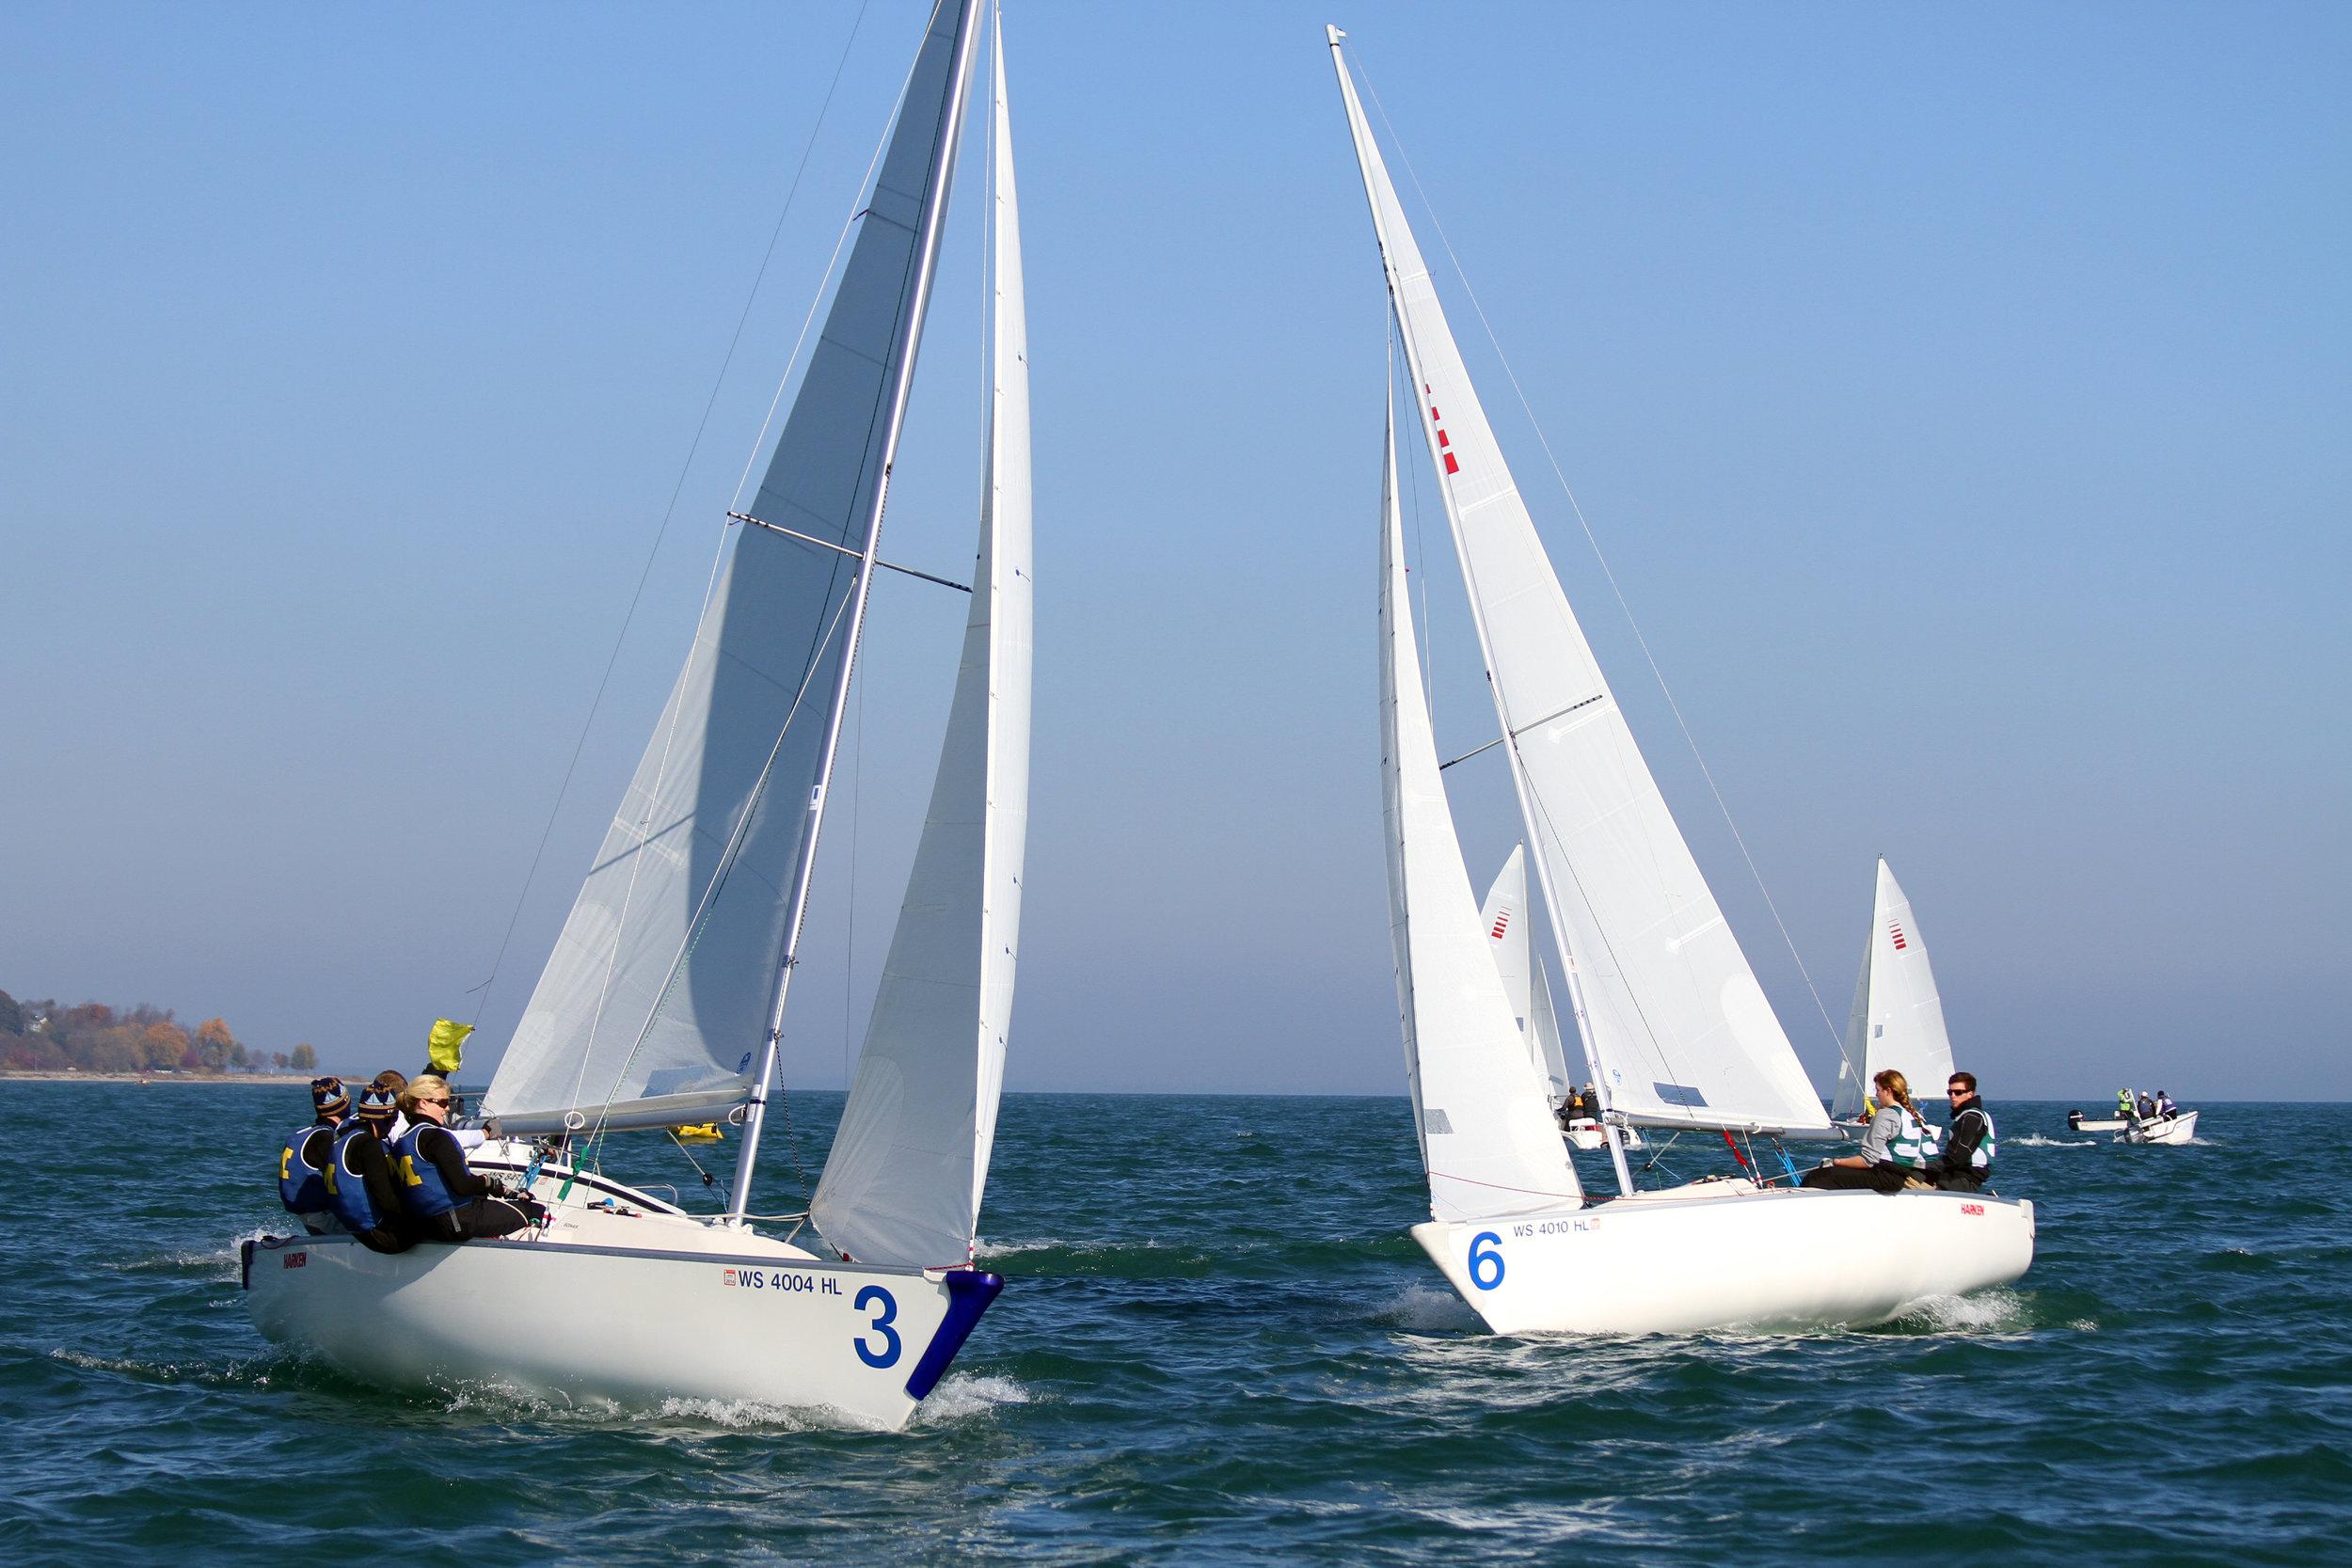 types of sailboat racing winter ed series seas